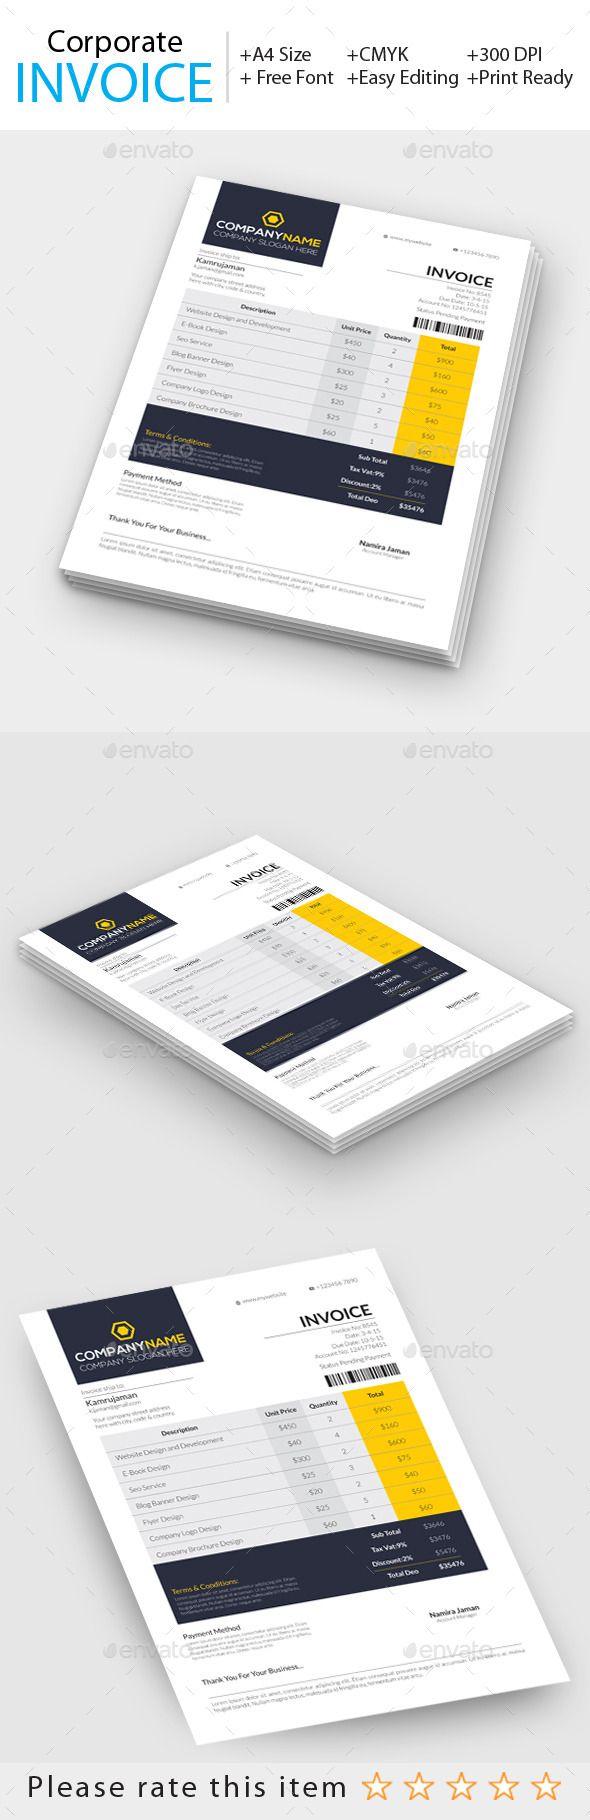 Corporate Invoice Template #invoice #design Download: http://graphicriver.net/item/corporate-invoice/11255210?ref=ksioks